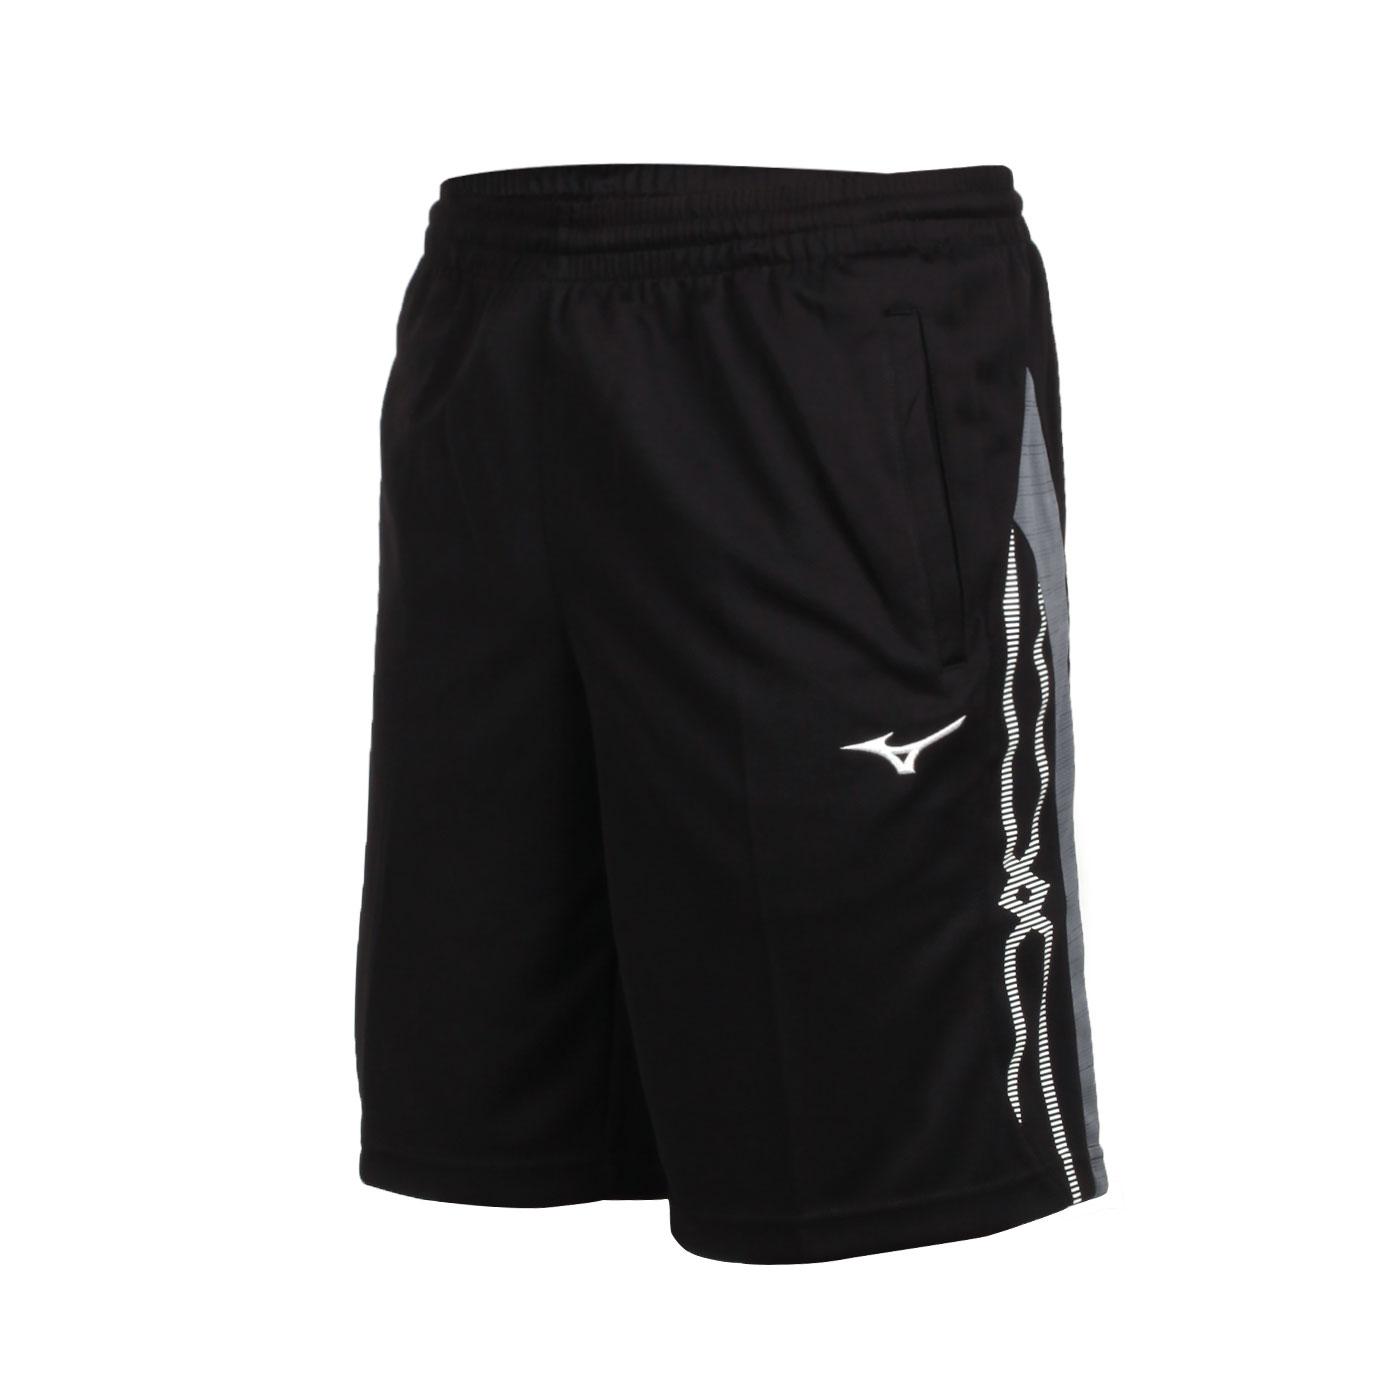 MIZUNO 男款針織短褲 32TB050214 - 黑灰白